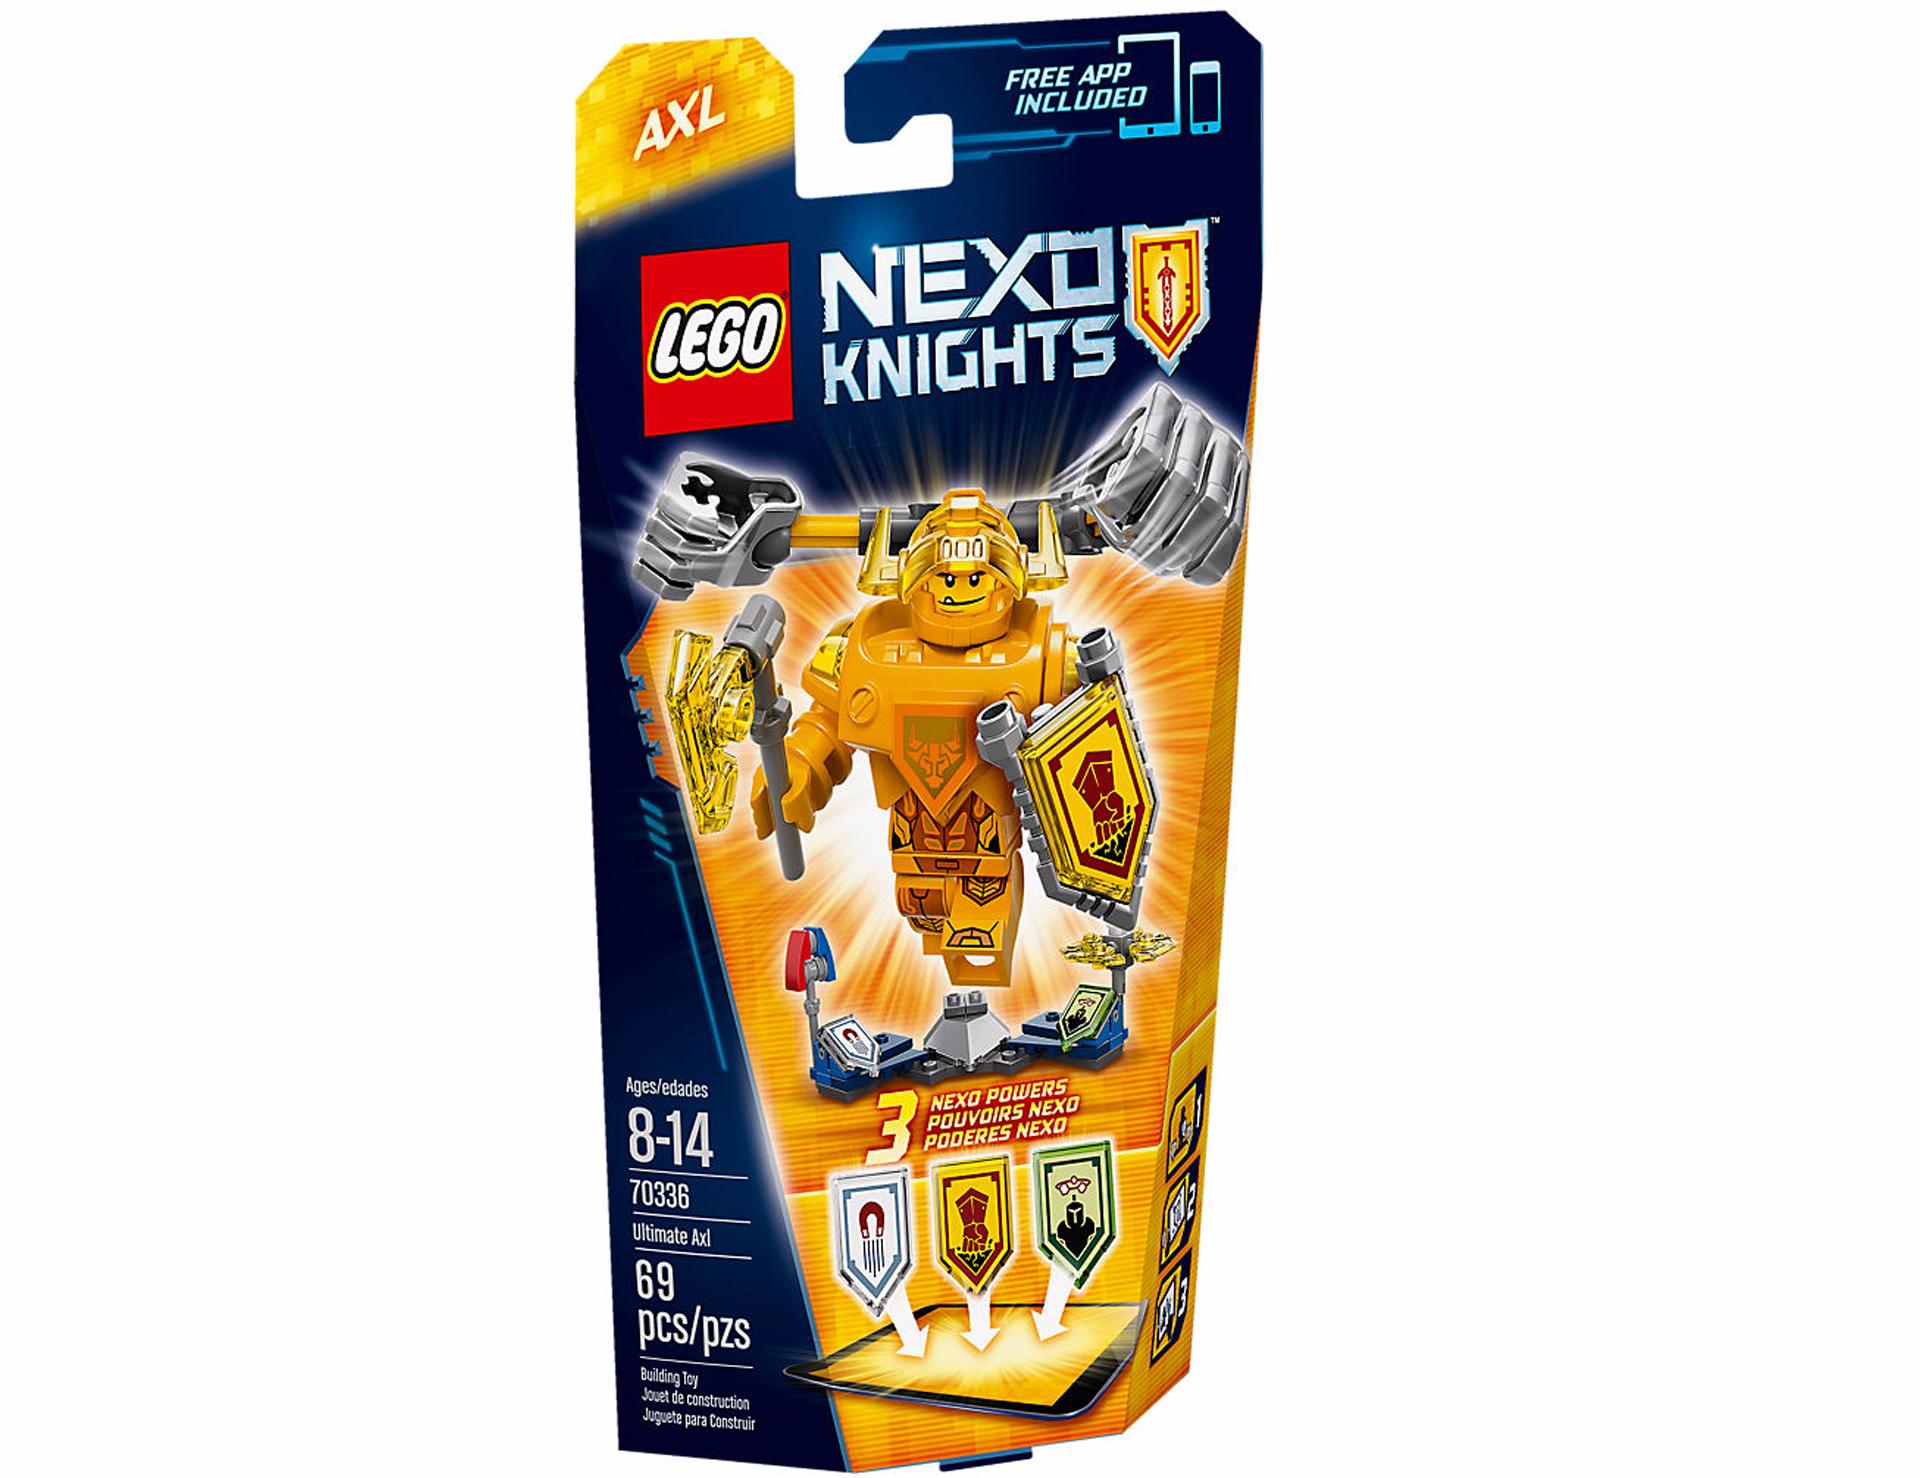 Lego Axl Chevalier Nexo L'ultime Knight zMGpqSUV